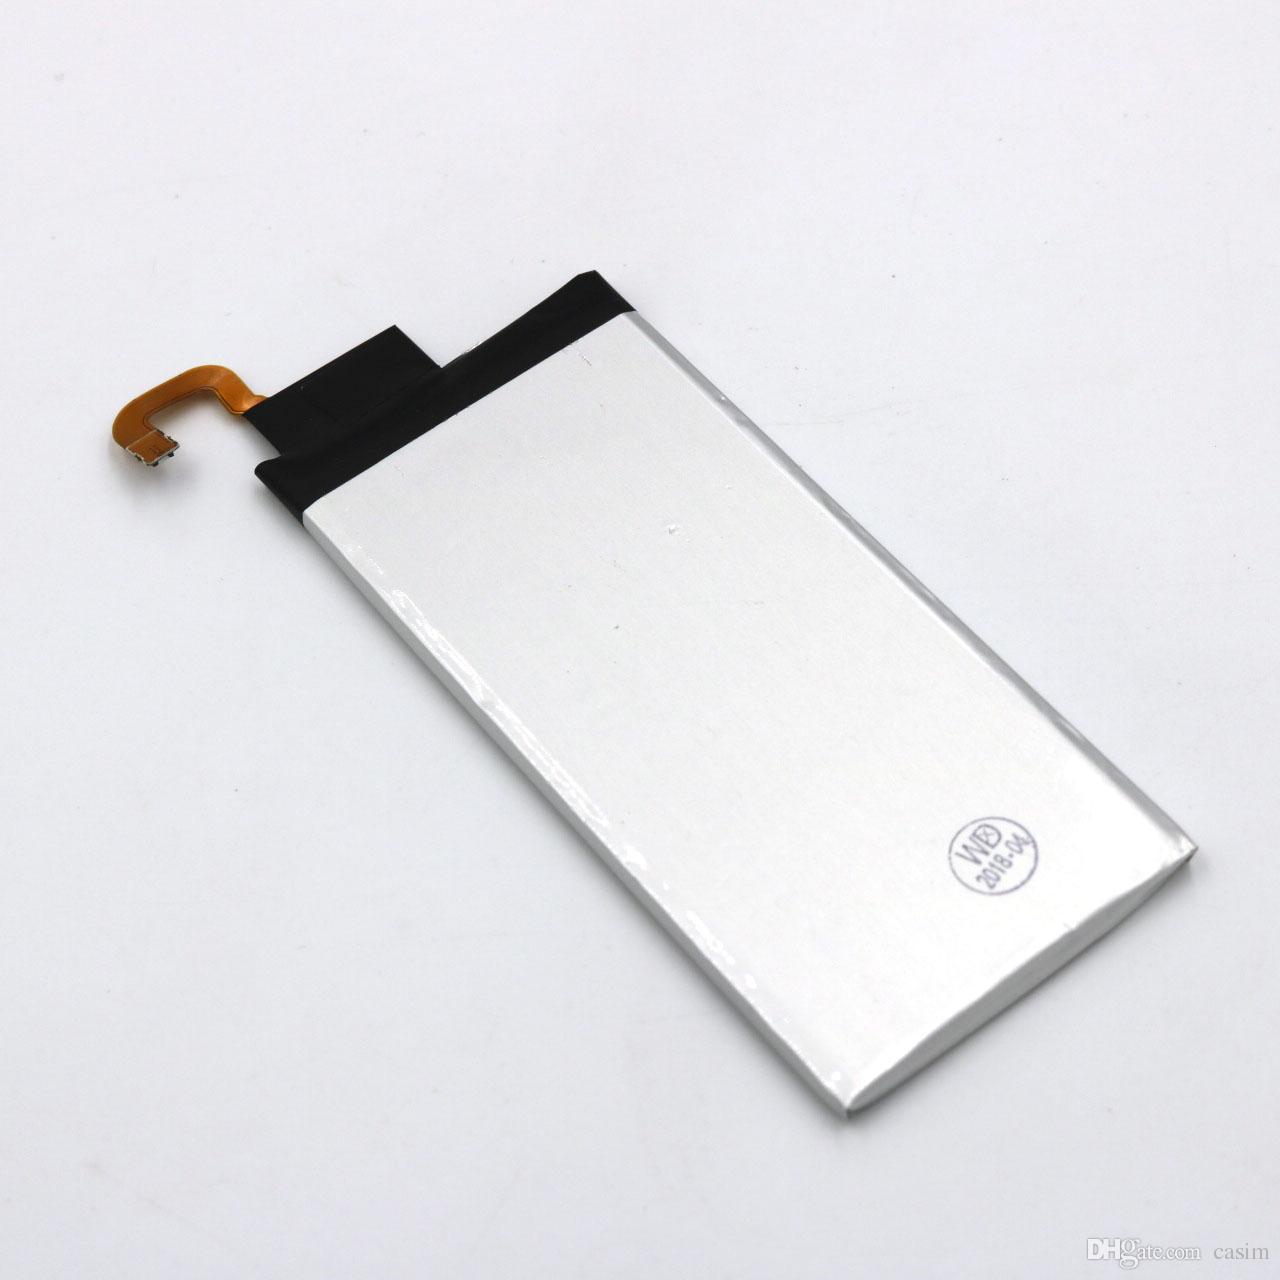 Fabrika Outlet Yüksek Kalite Galaxy S6 Kenar Pil EB-BG925ABE Telefon batterie Samsung Galaxy S6 Kenar Için Dahili Yedek Bateria Akku